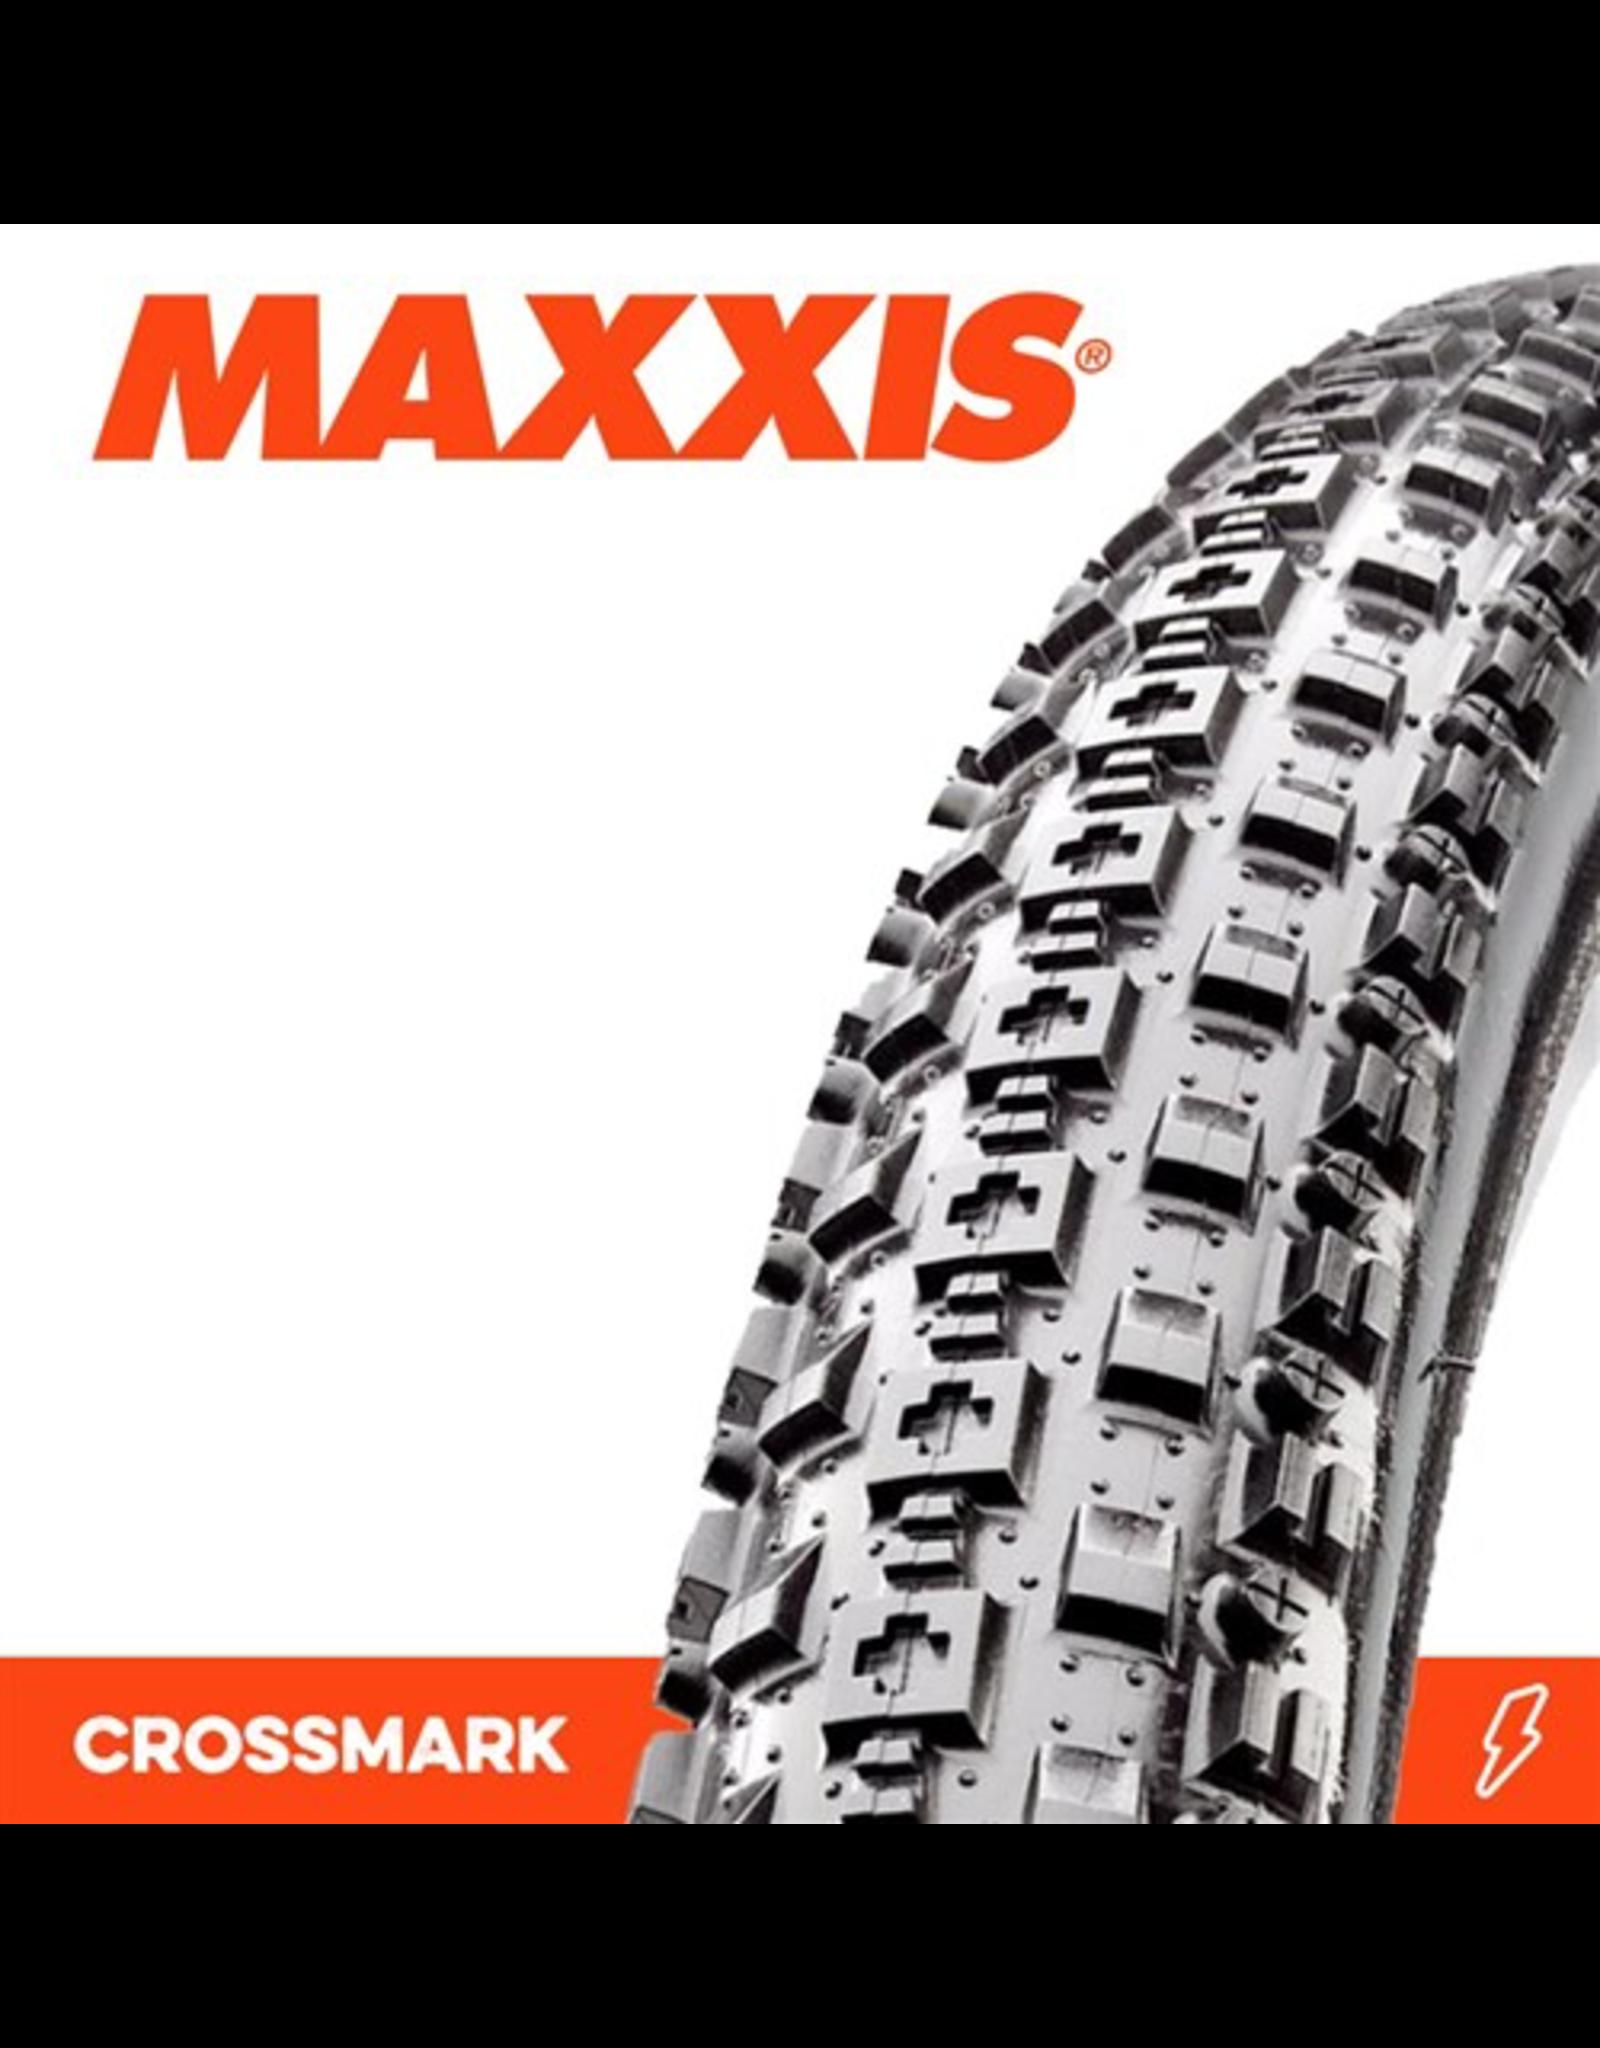 "MAXXIS MAXXIS CROSSMARK 26 X 2.25"" WIRE BEAD 60TPI TYRE"